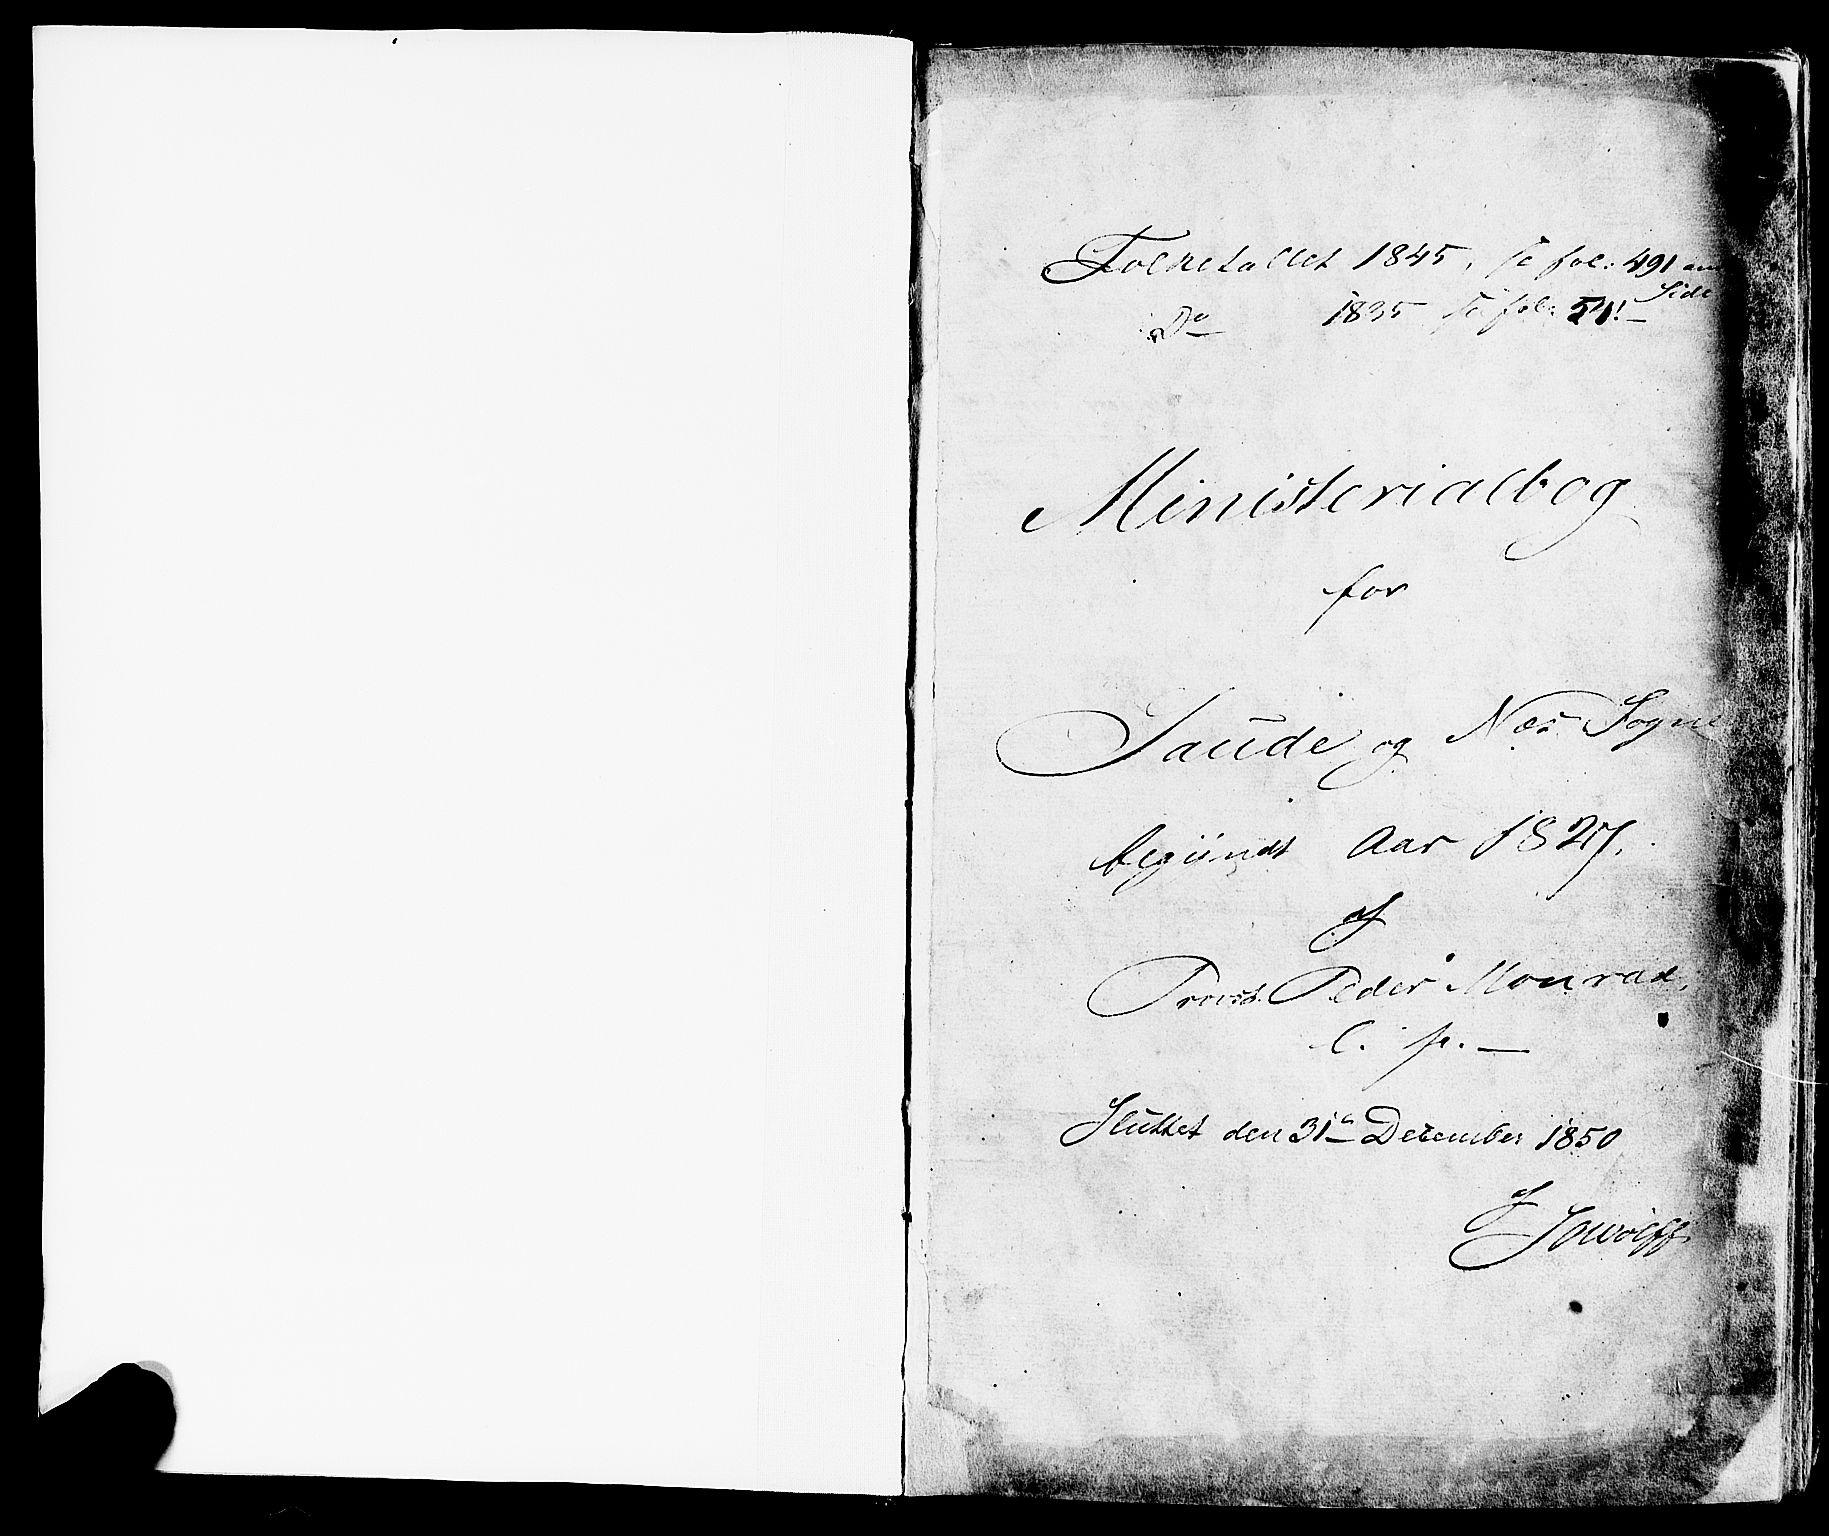 SAKO, Sauherad kirkebøker, F/Fa/L0006: Ministerialbok nr. I 6, 1827-1850, s. 1